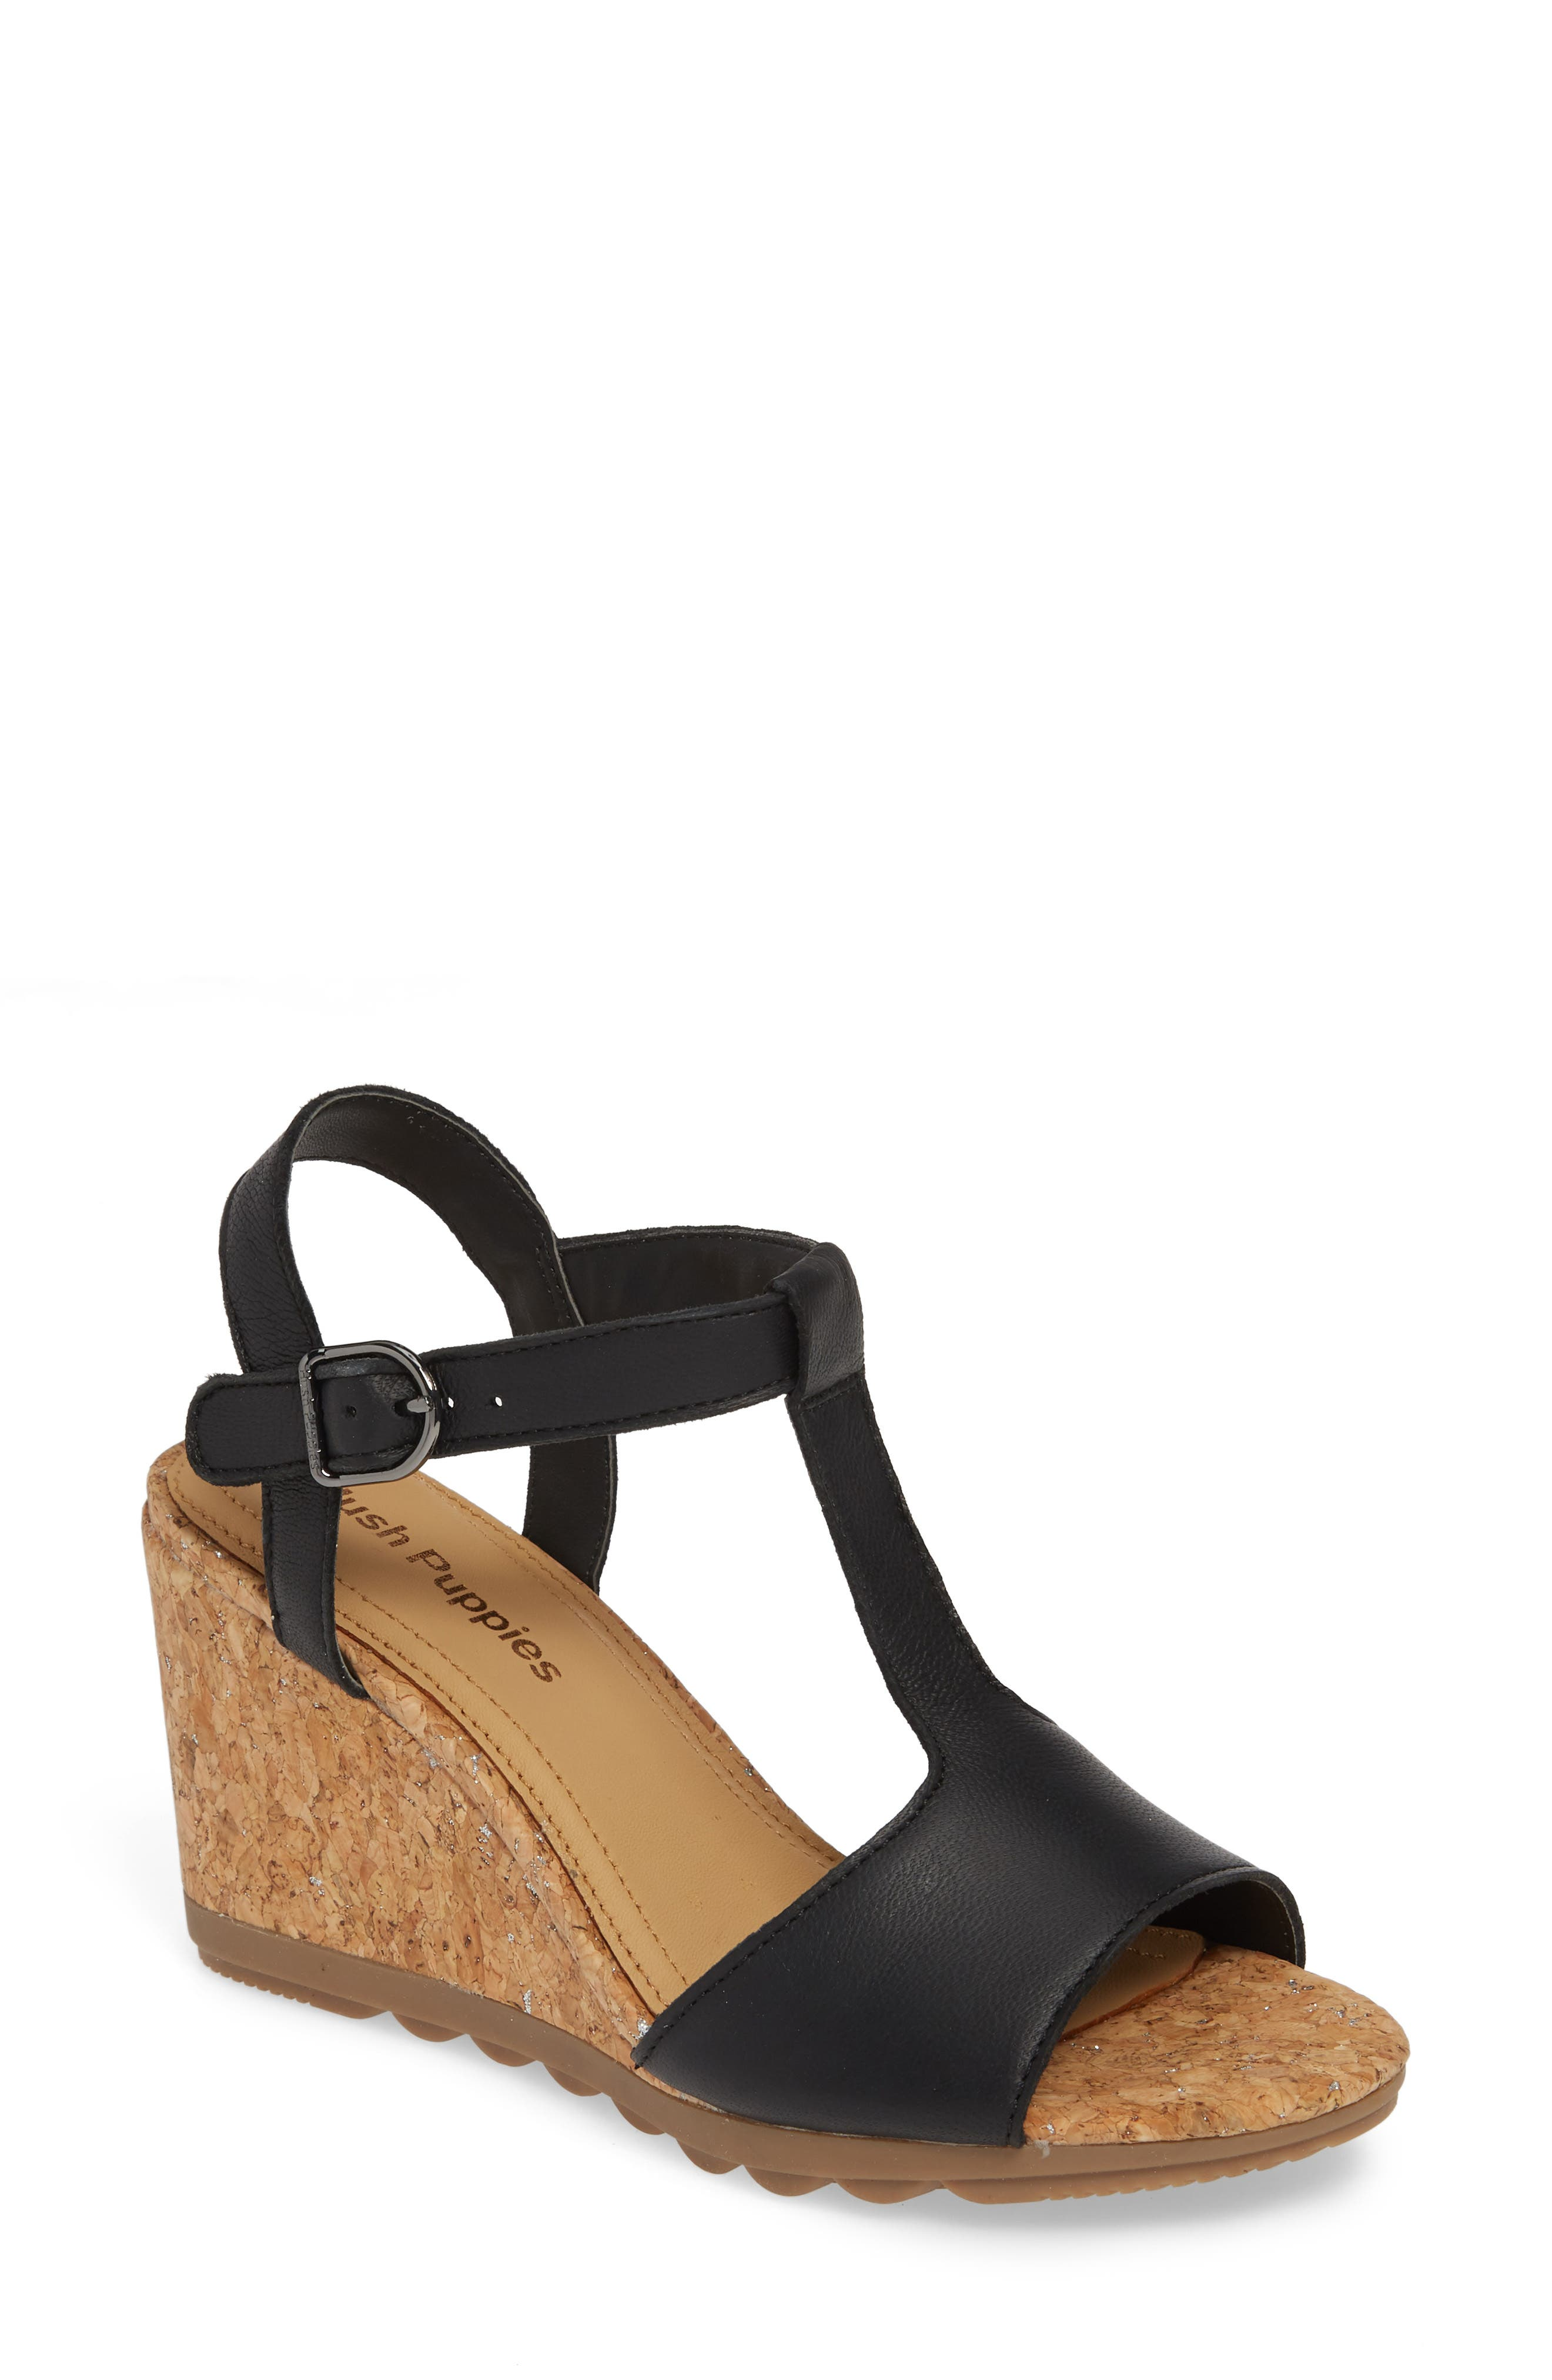 Pekingese Wedge Sandal, Main, color, BLACK LEATHER